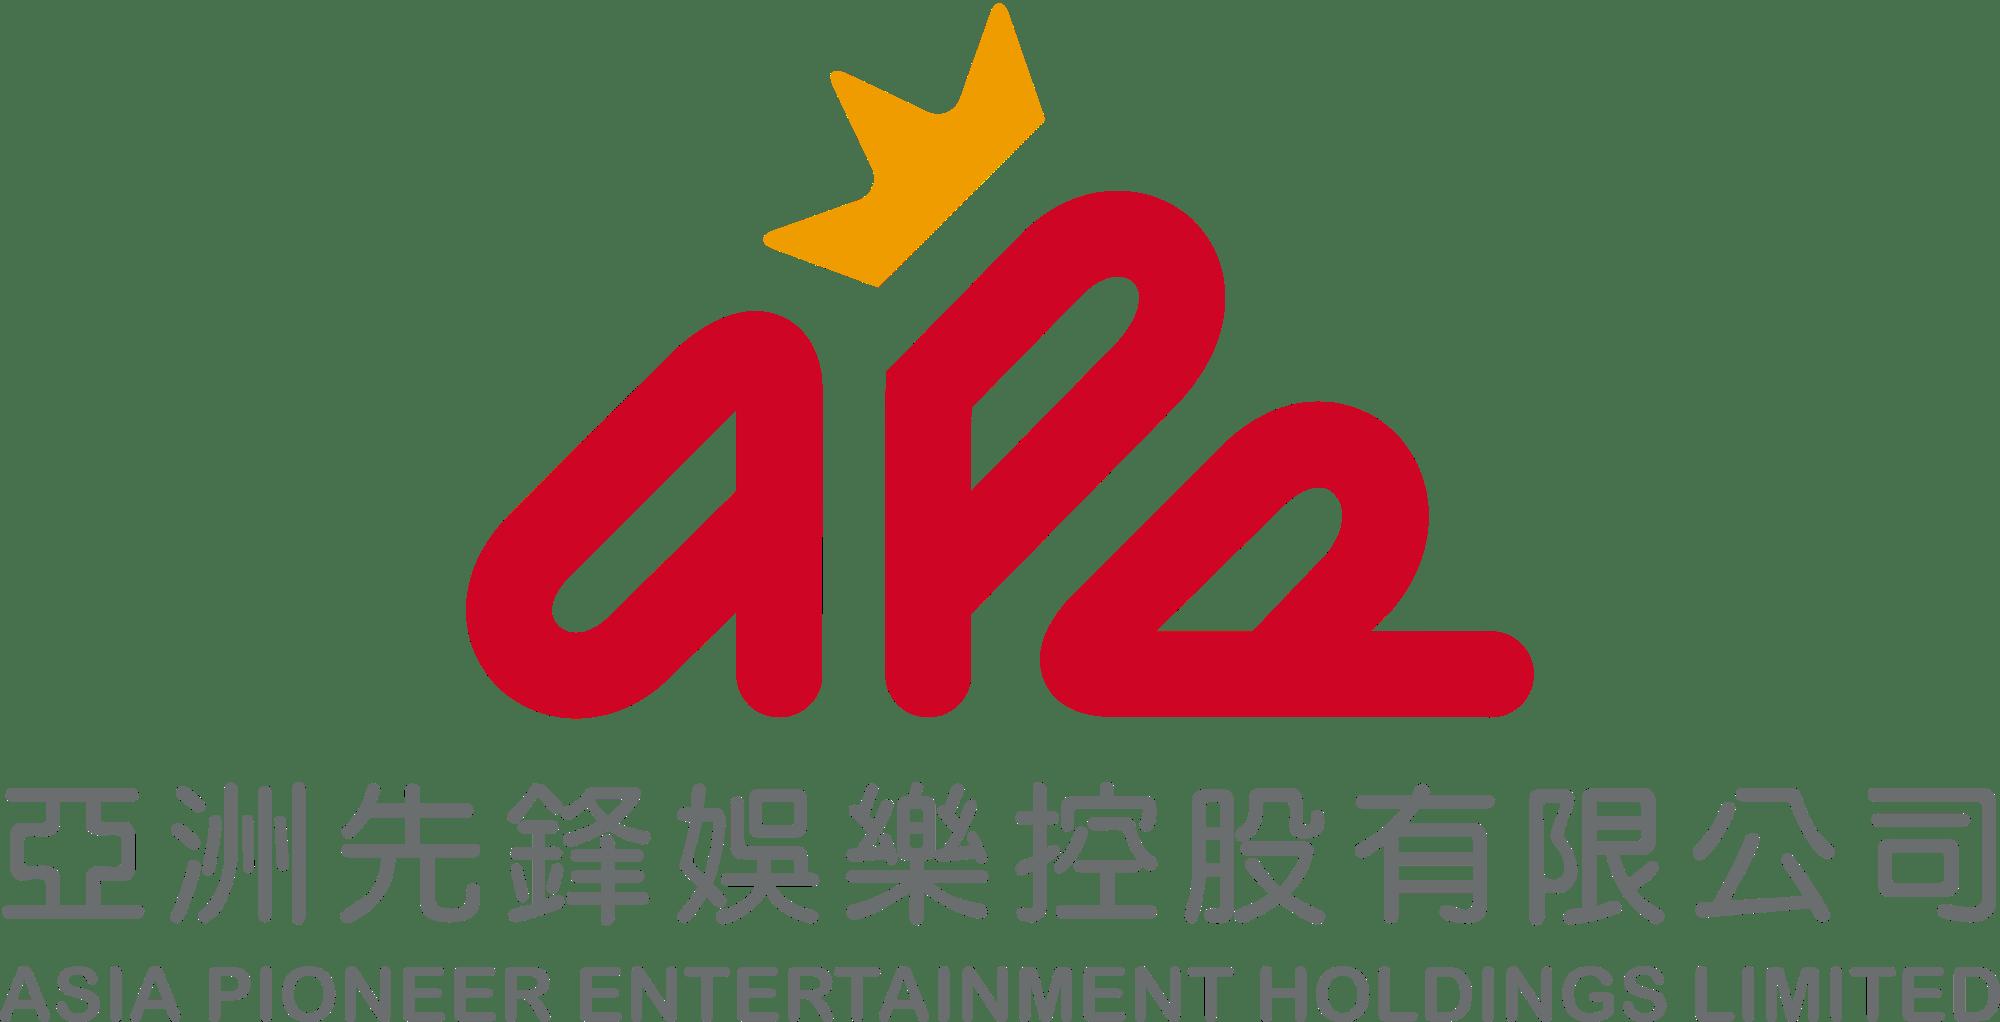 APE-Holdings Logo (Ver)_Transparent_Dark grey_CMYK_bigger words (smaller logo size)